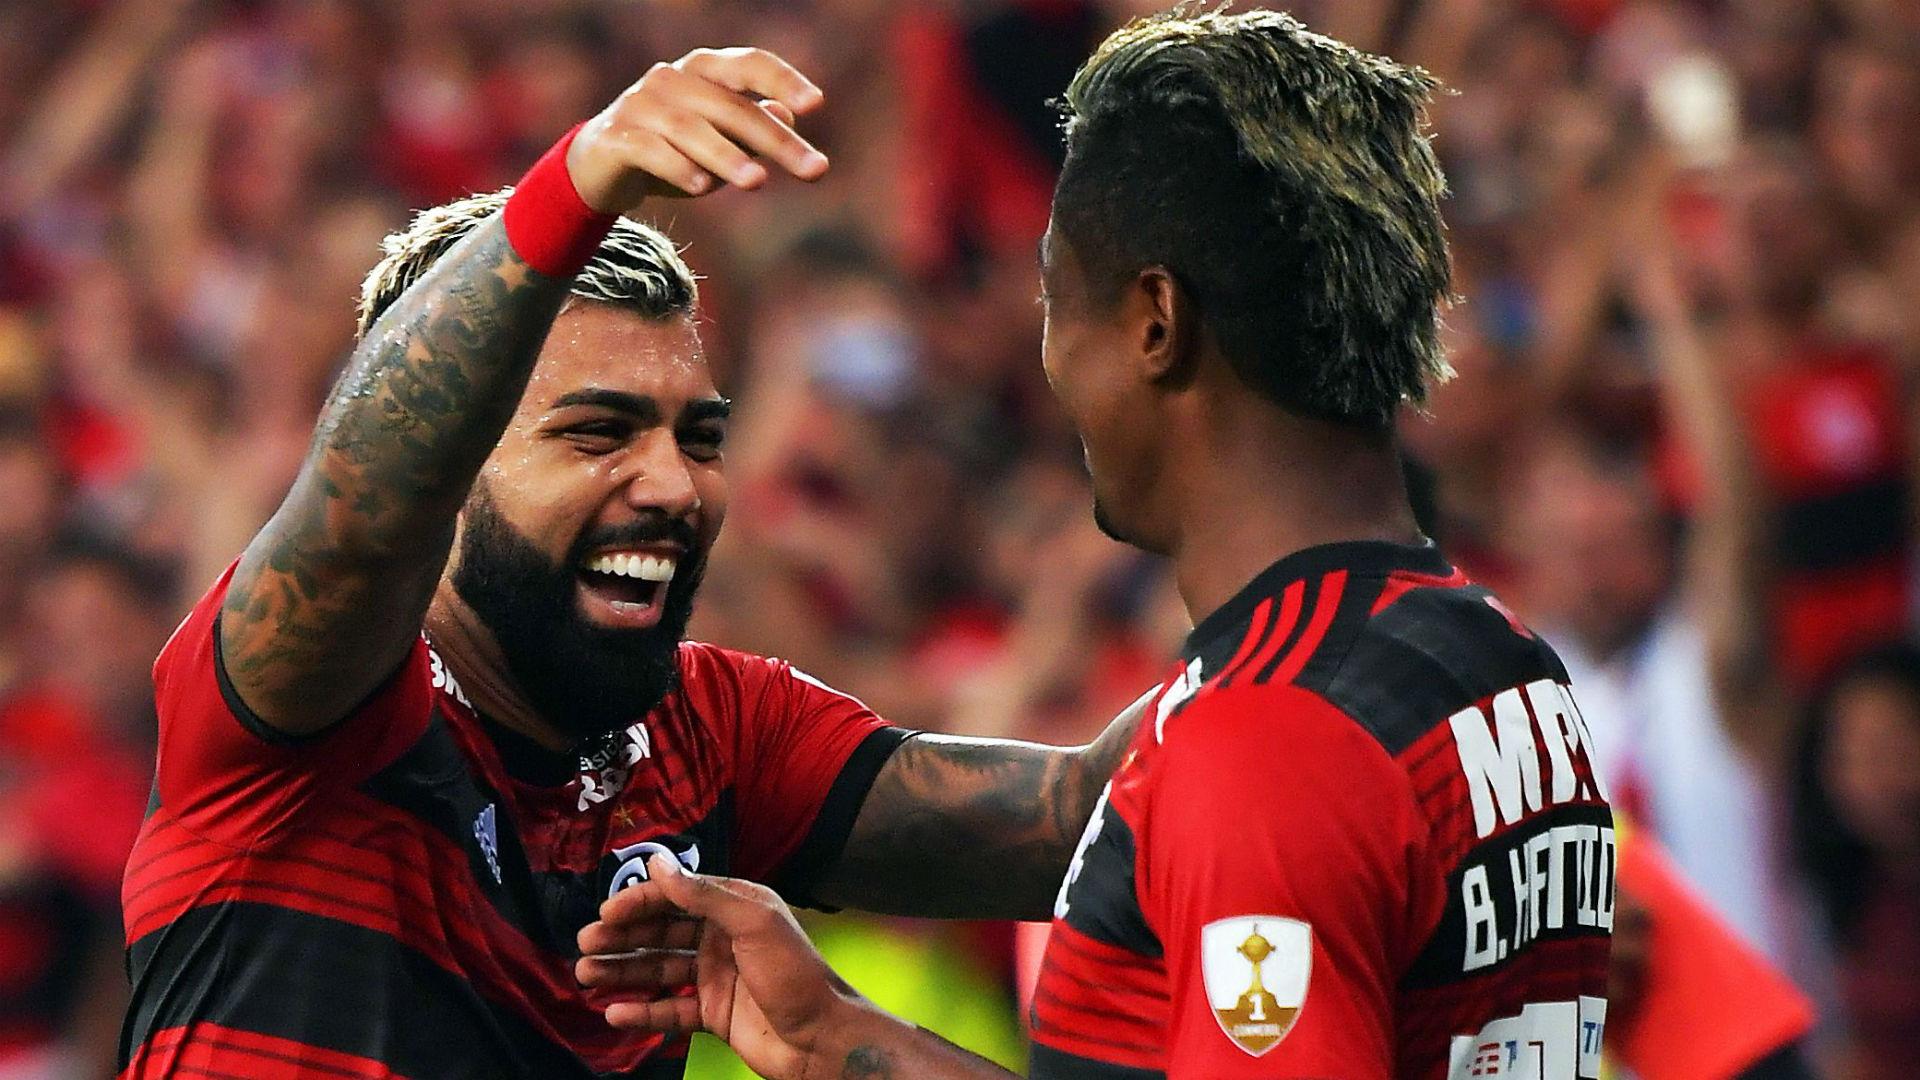 São Paulo X Corinthians, Vasco X Flamengo